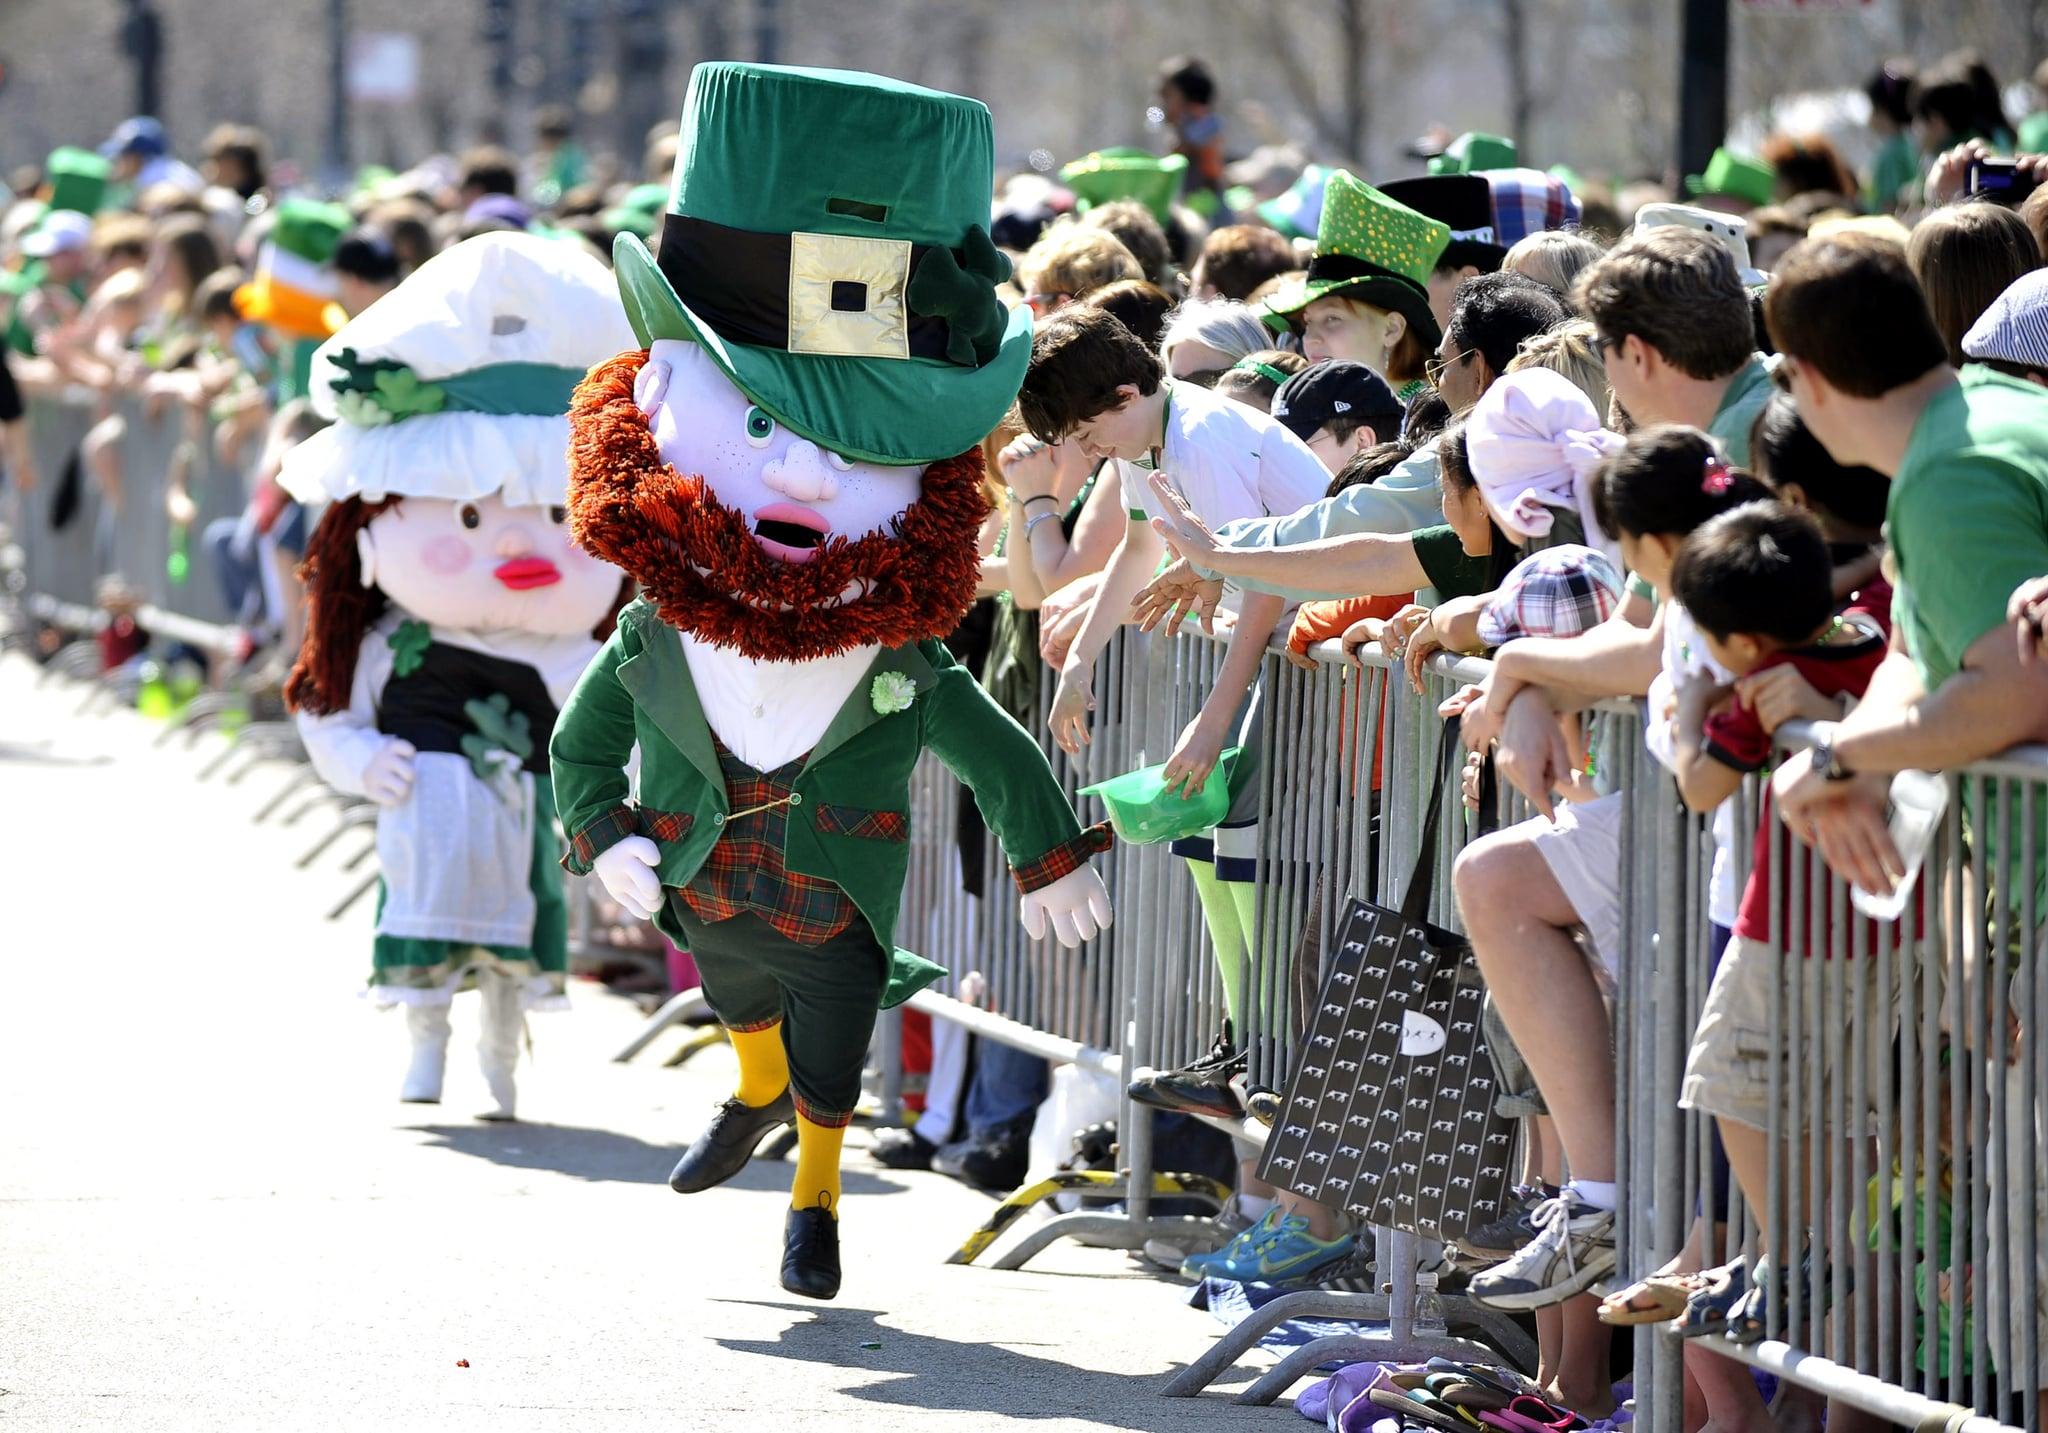 And leprechaun mascots.